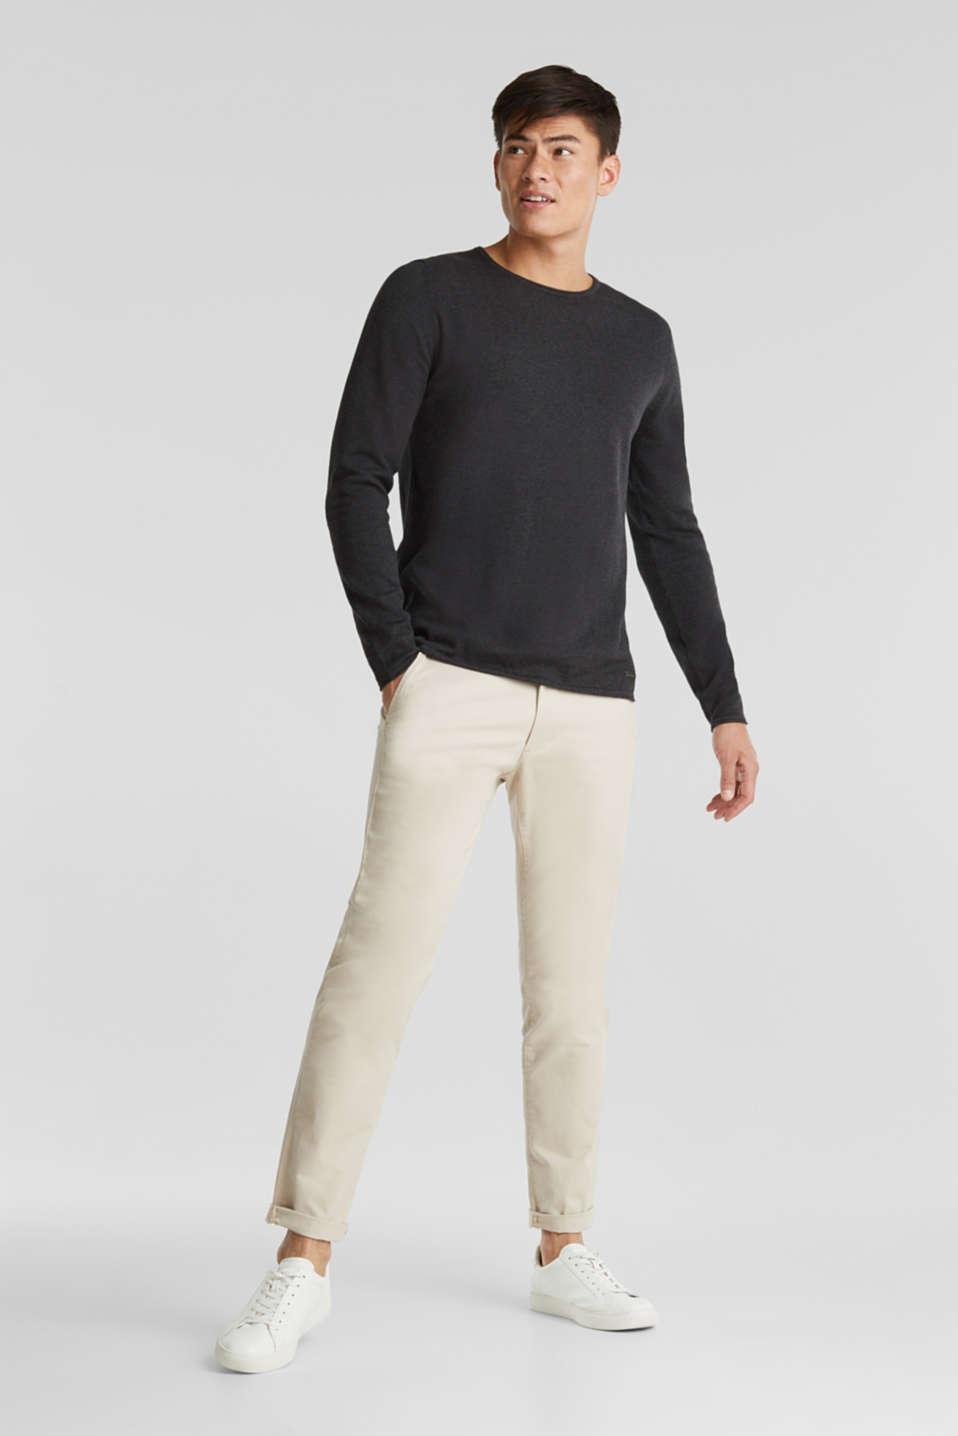 Fine knit cotton jumper, DARK GREY, detail image number 1